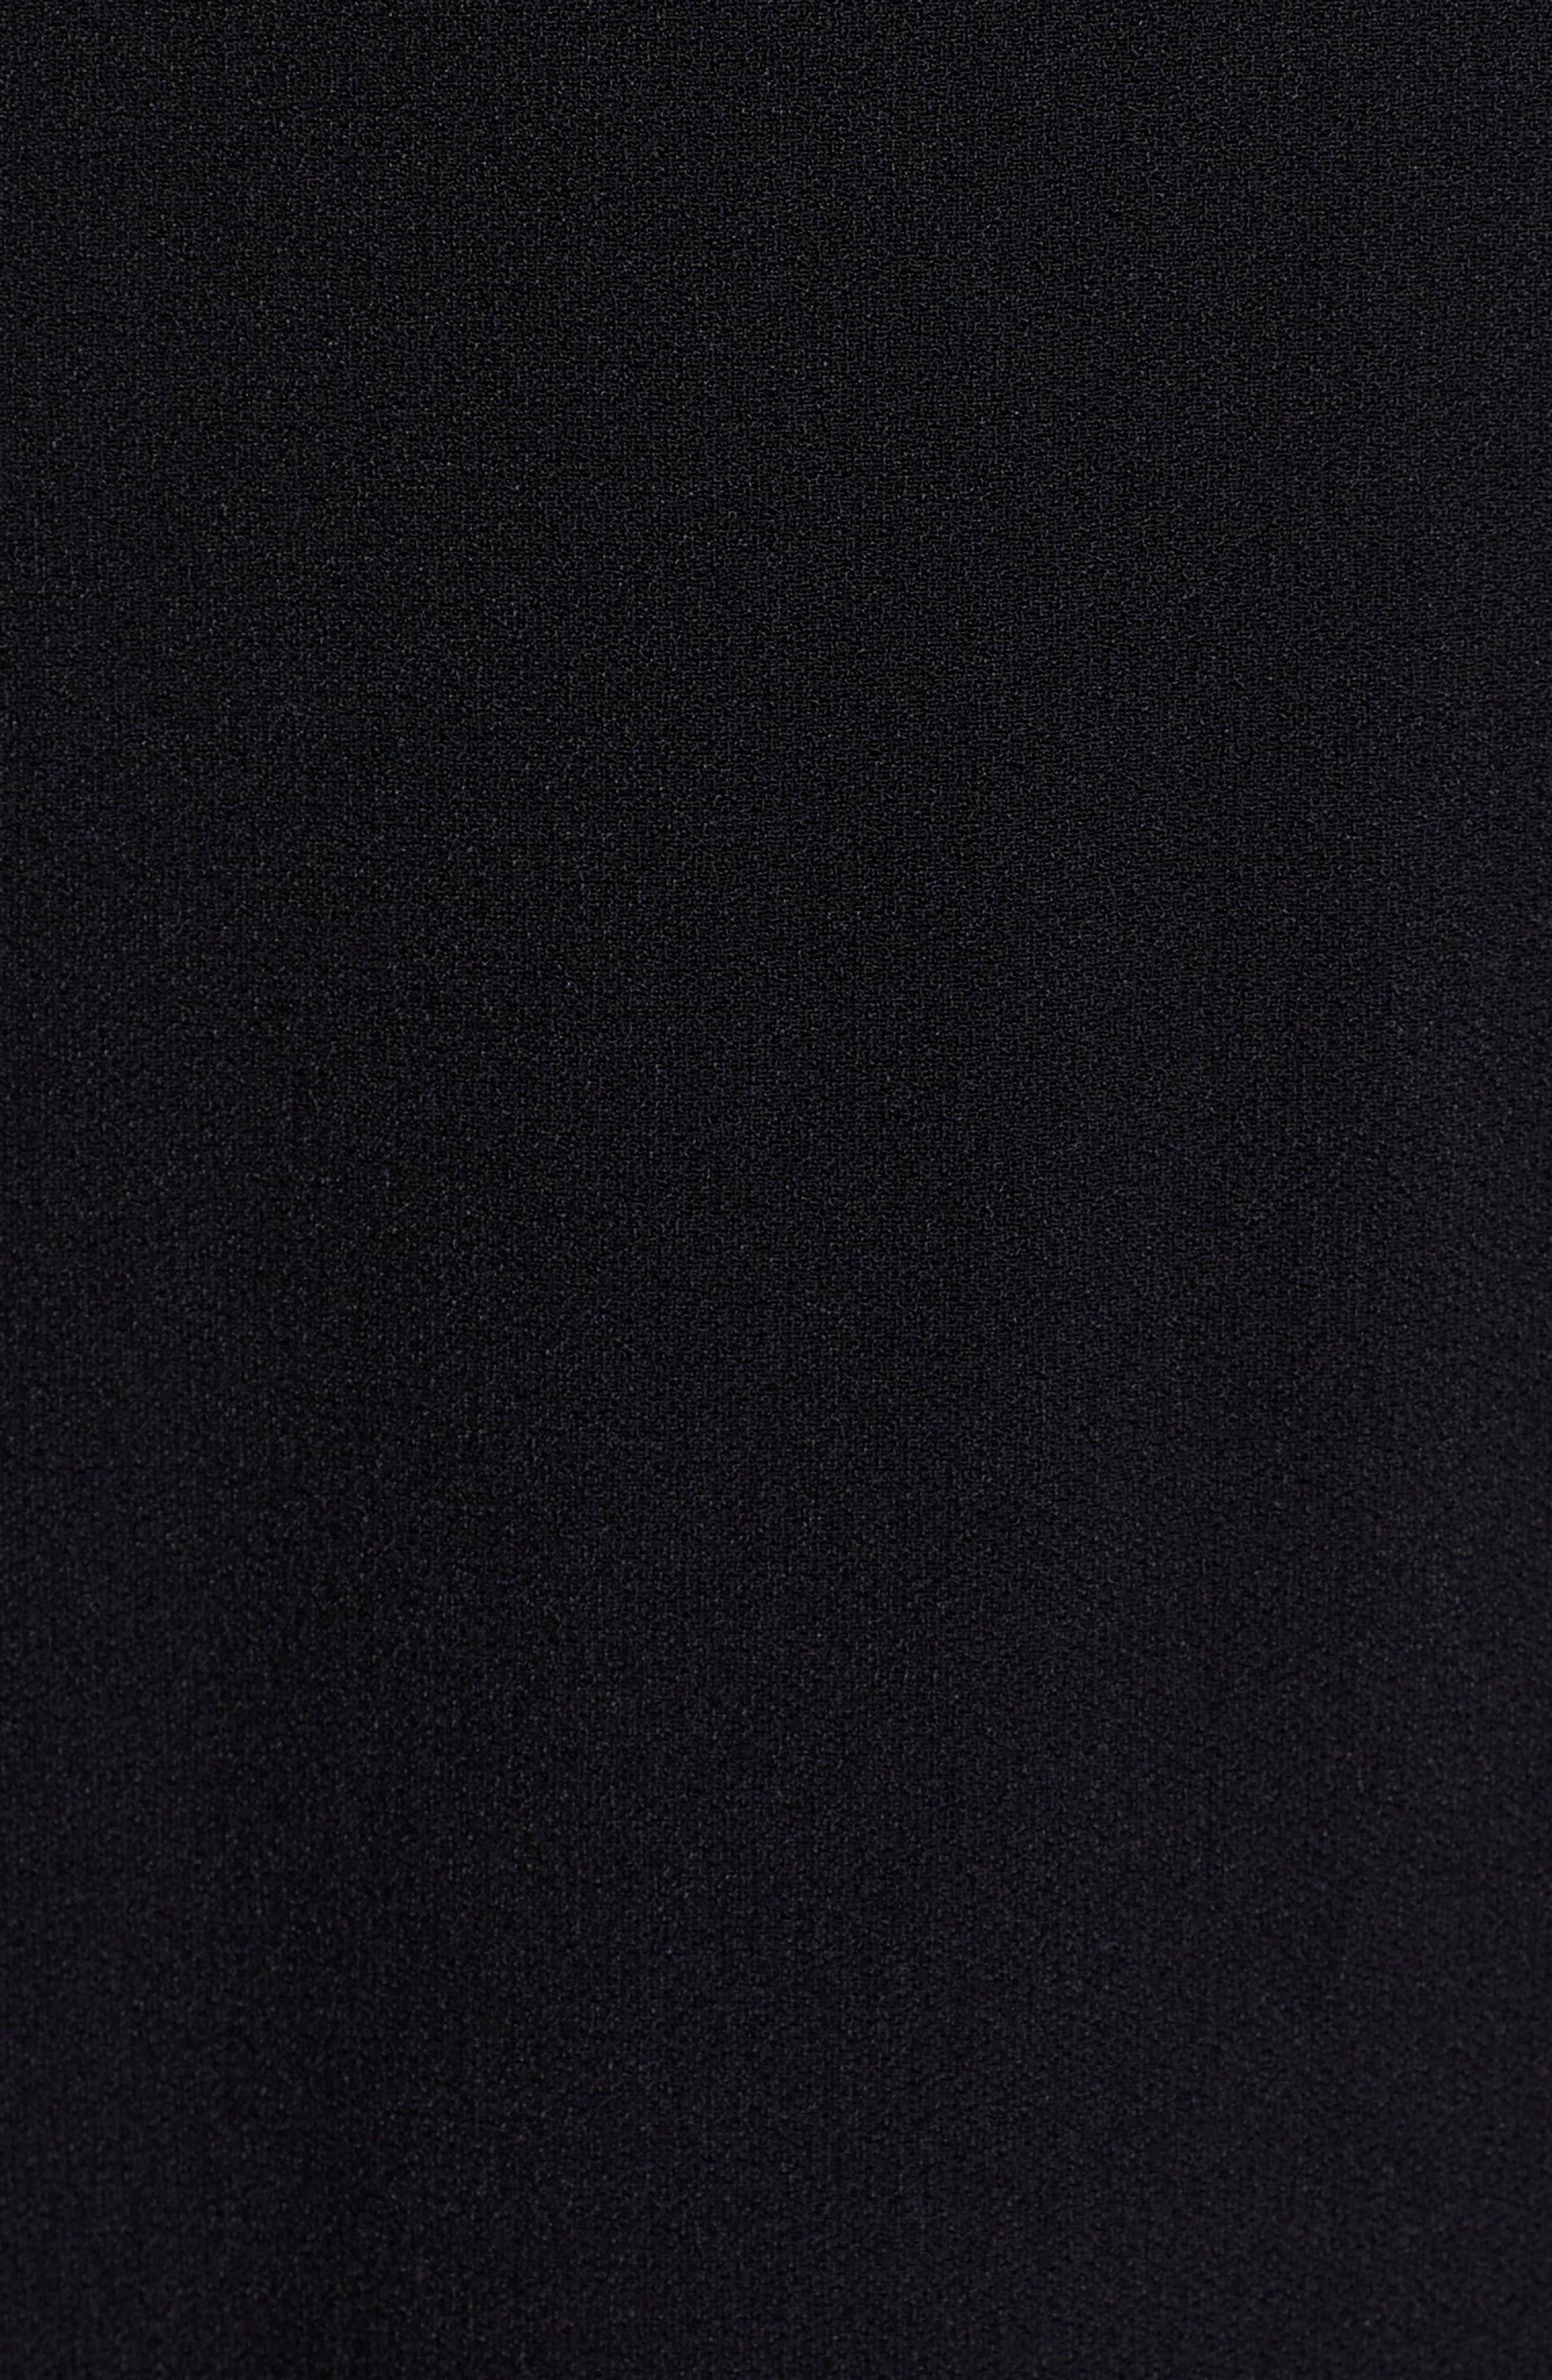 Demana A-Line Dress,                             Alternate thumbnail 5, color,                             Black